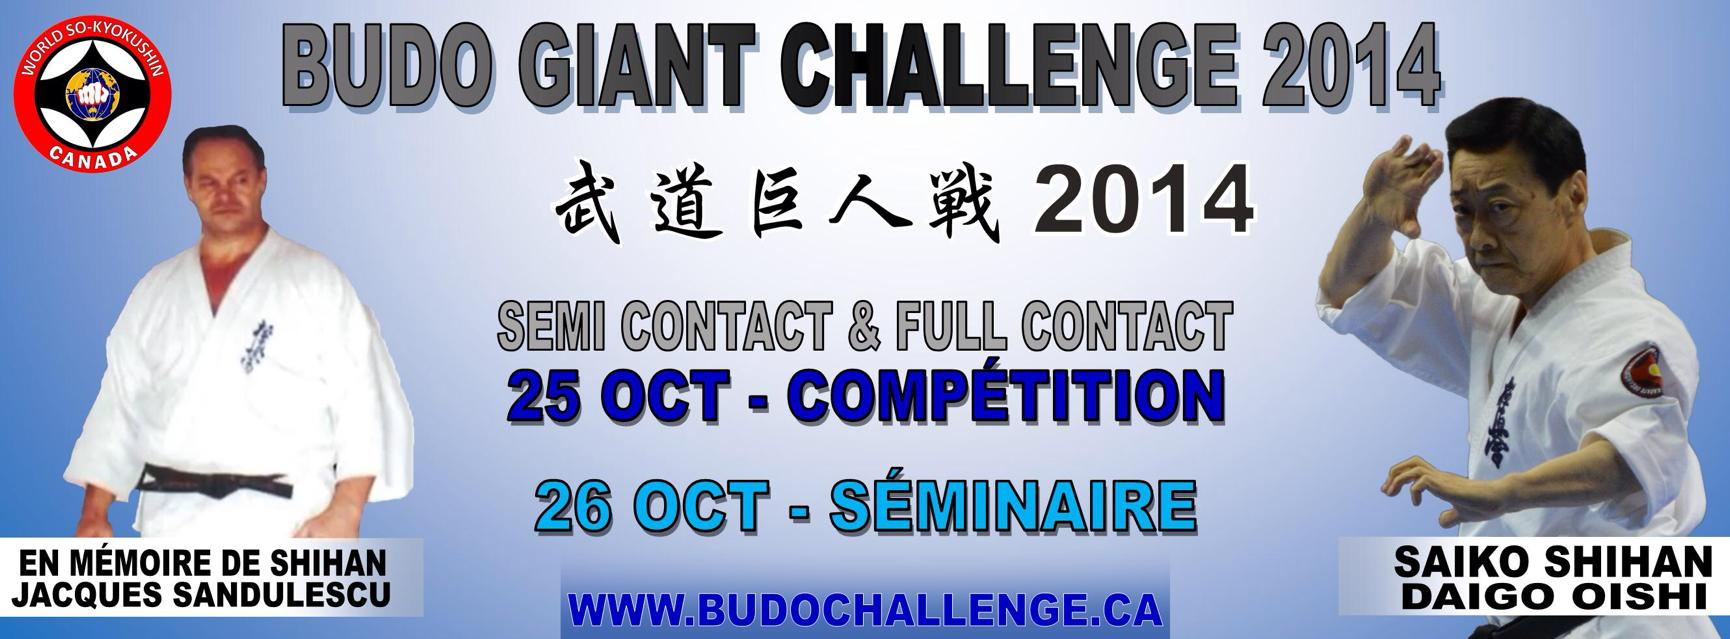 BUDO GIANT CHALLENGE 2014(CANADA)